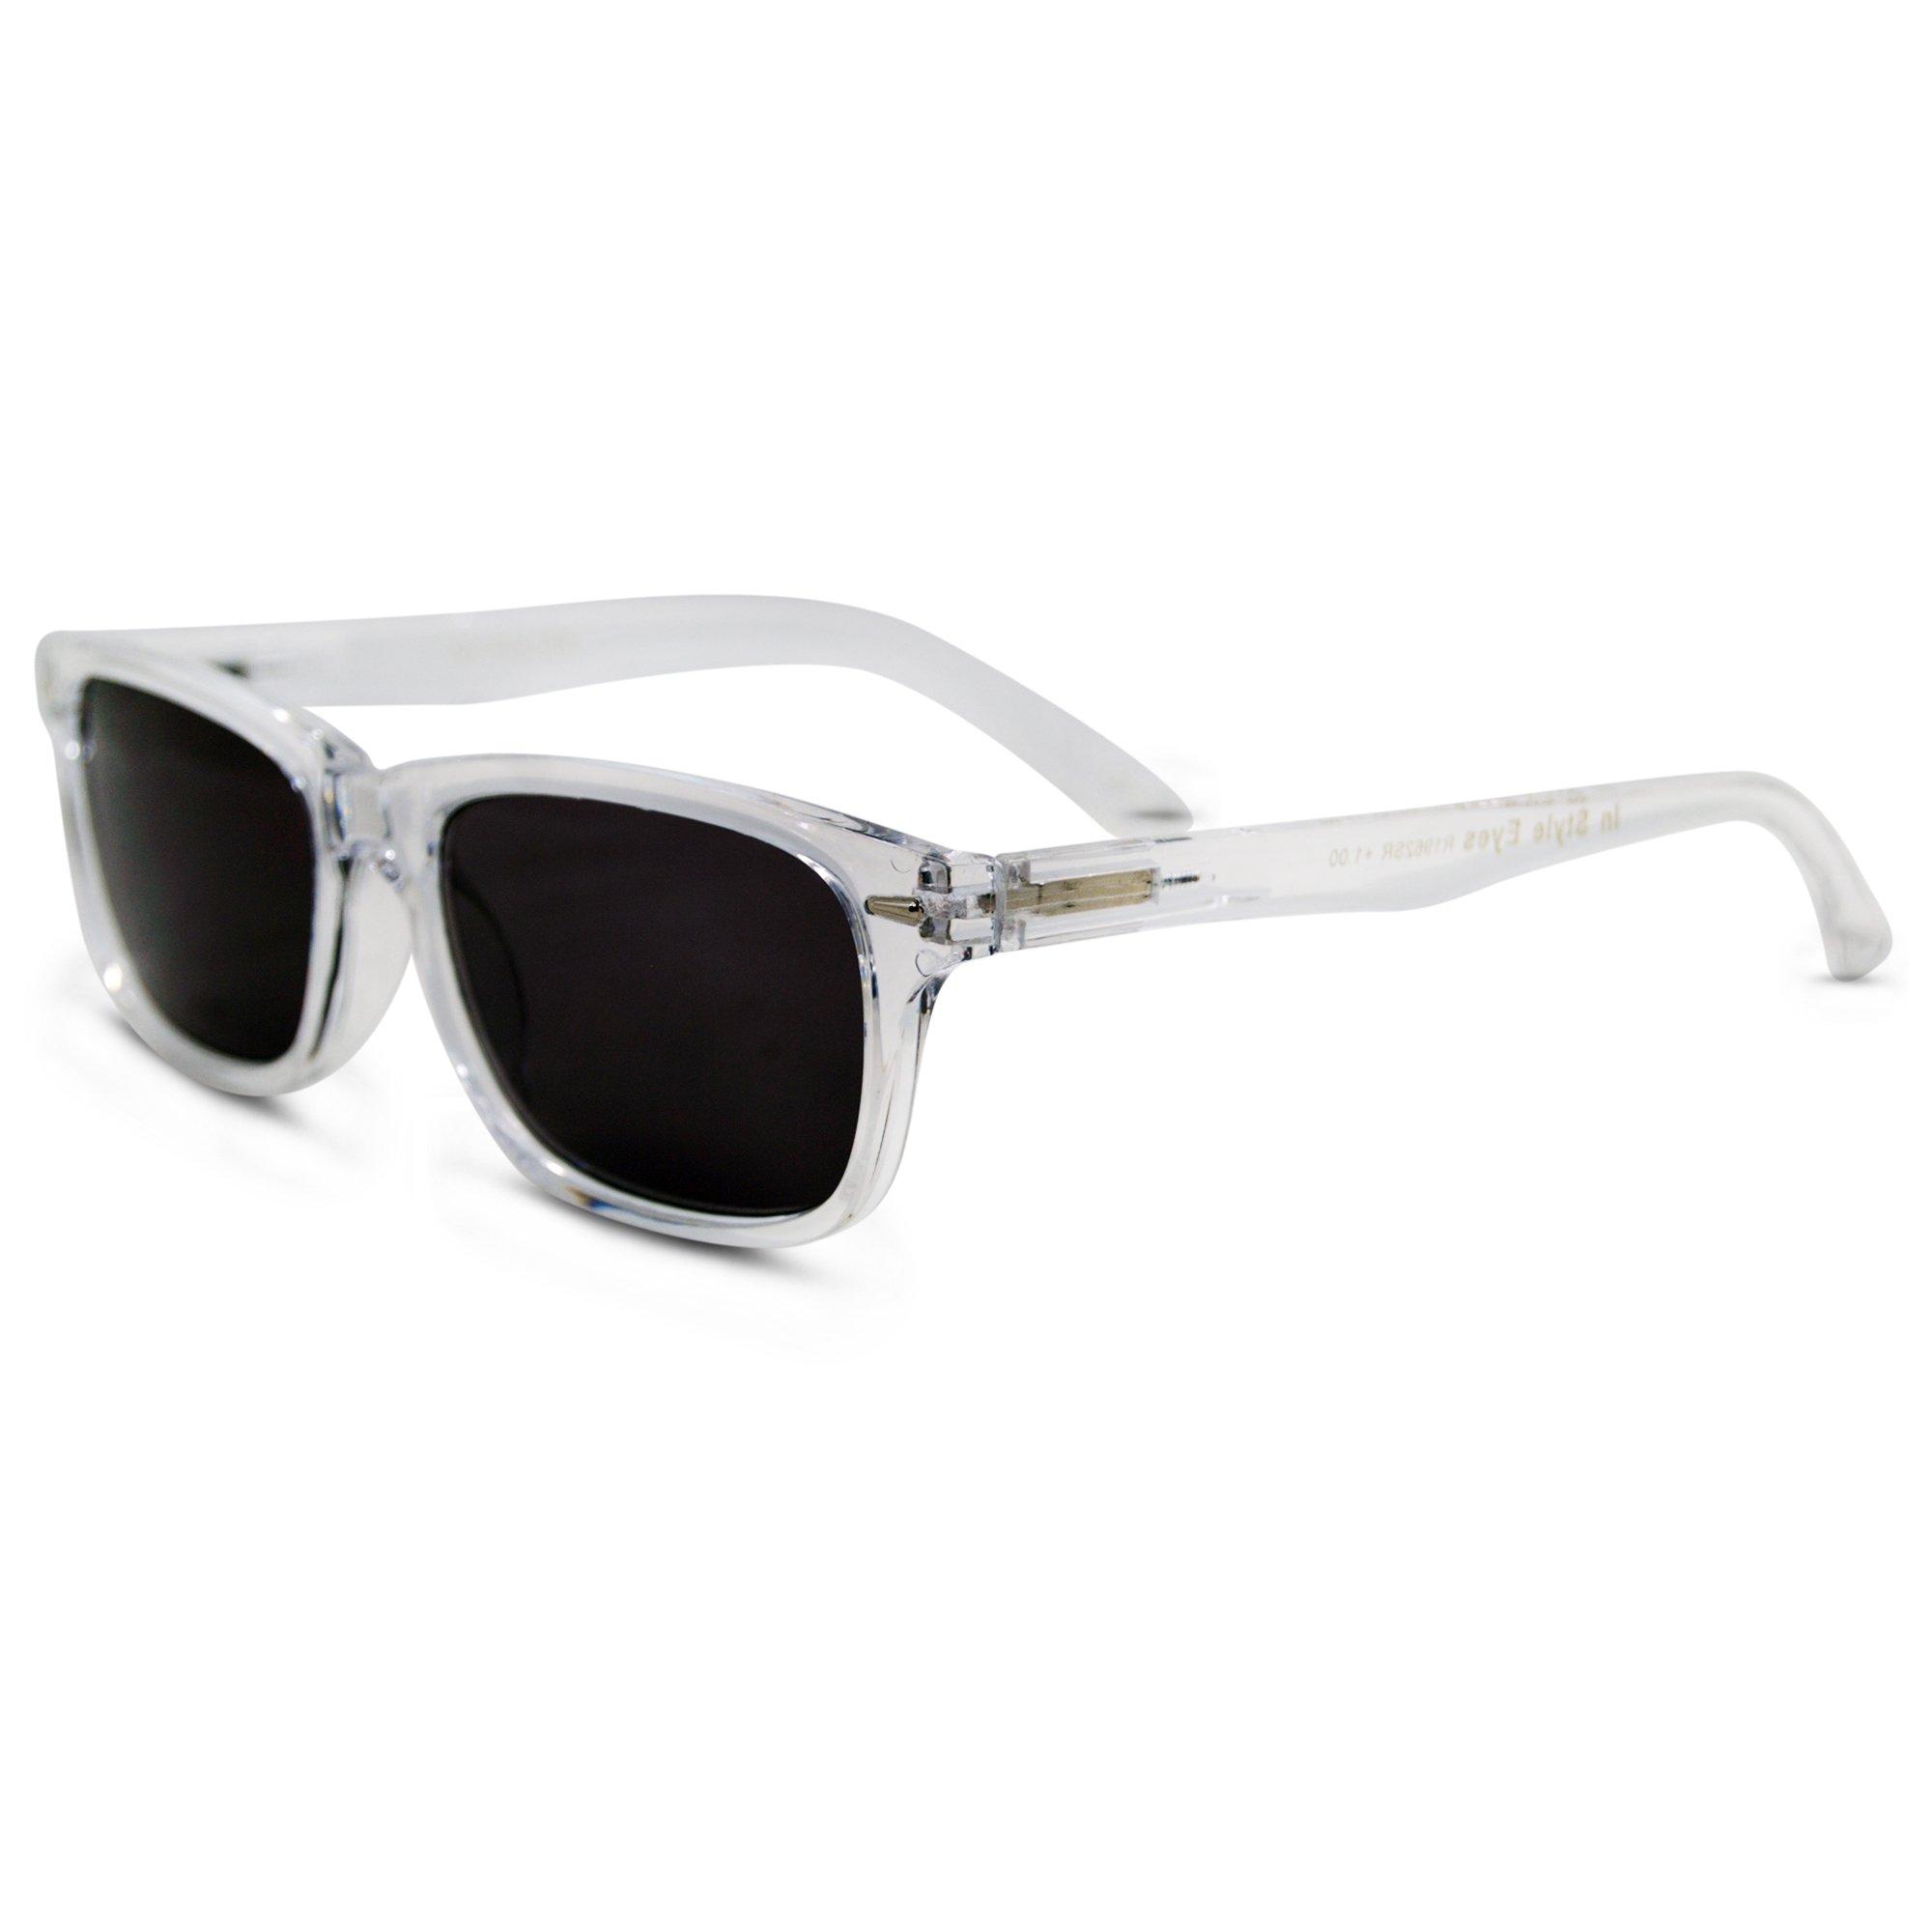 In Style Eyes Seymore Wayfarer Reading Sunglasses, NOT Bifocals Clear 3.50